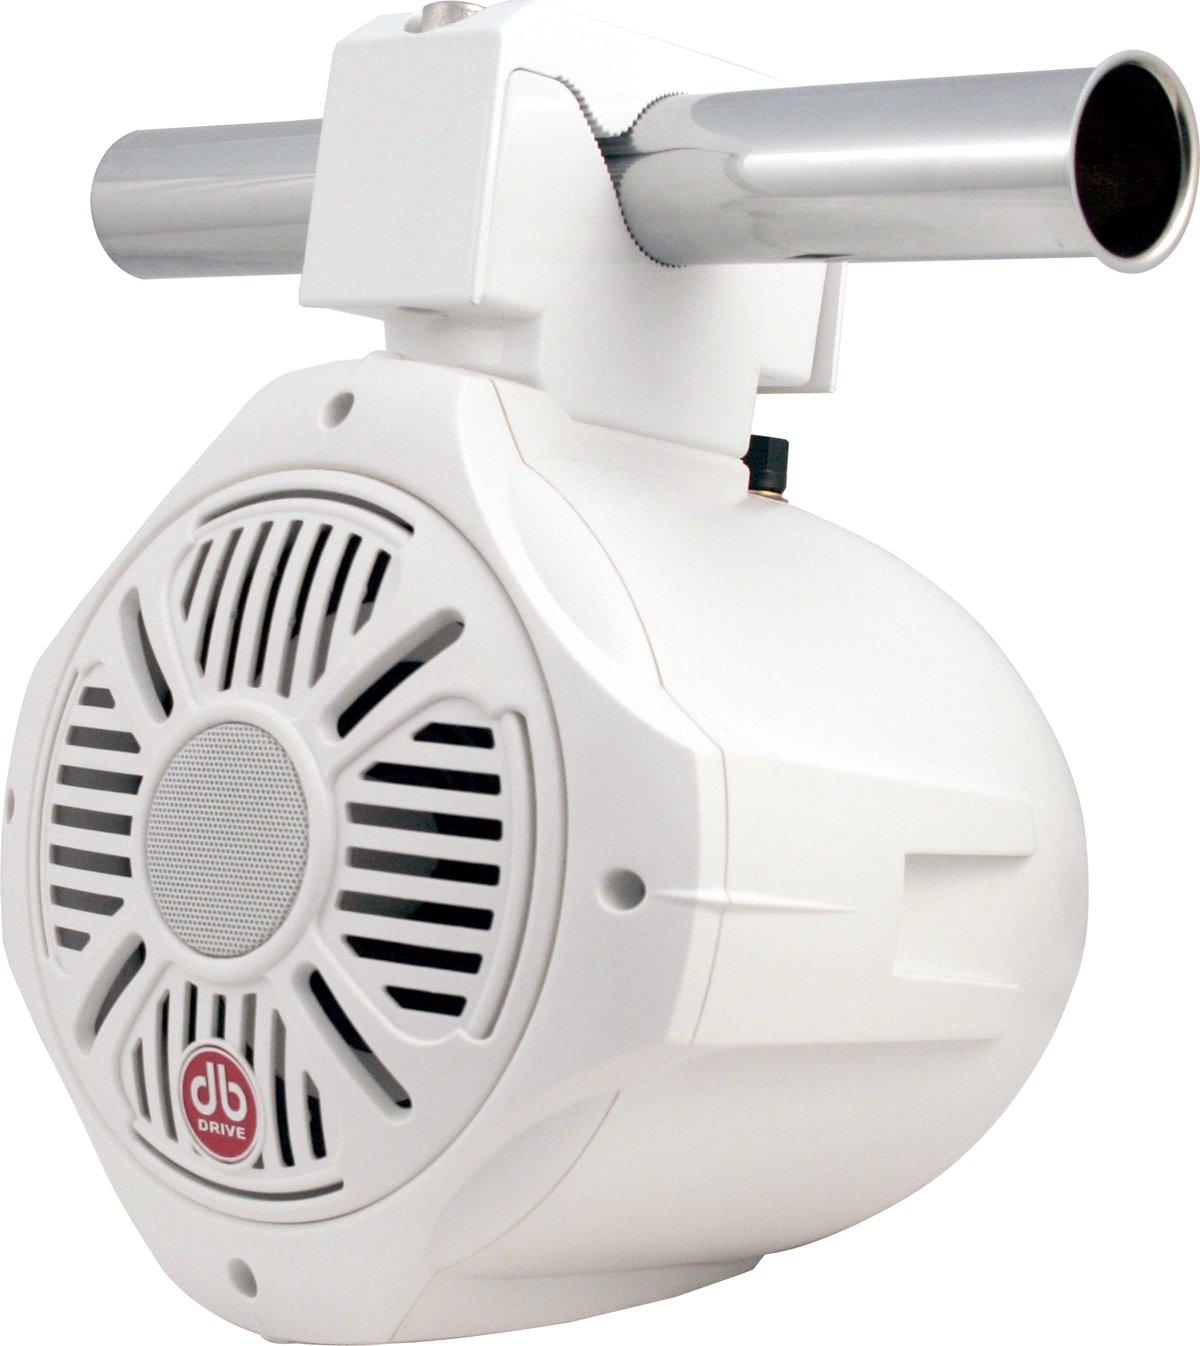 db Drive APT6.0PRO-W Amphibious Pro Audio Marine Tower Speakers 500W DB Research L.L.P. White Set of 1